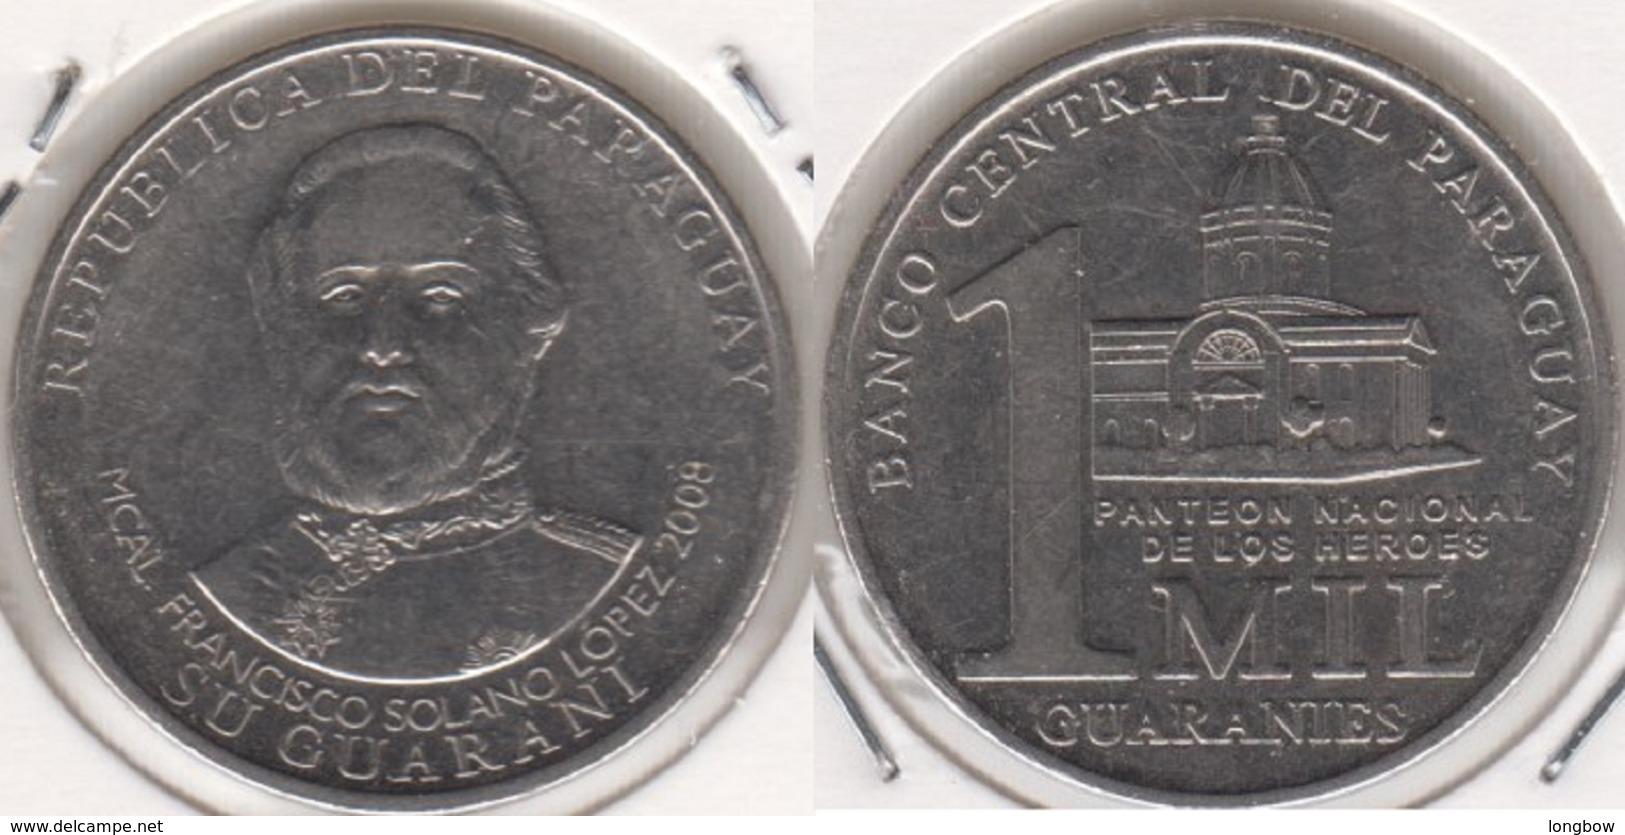 Paraguay 1000 Guaranies 2008 KM#198 - Used - Paraguay